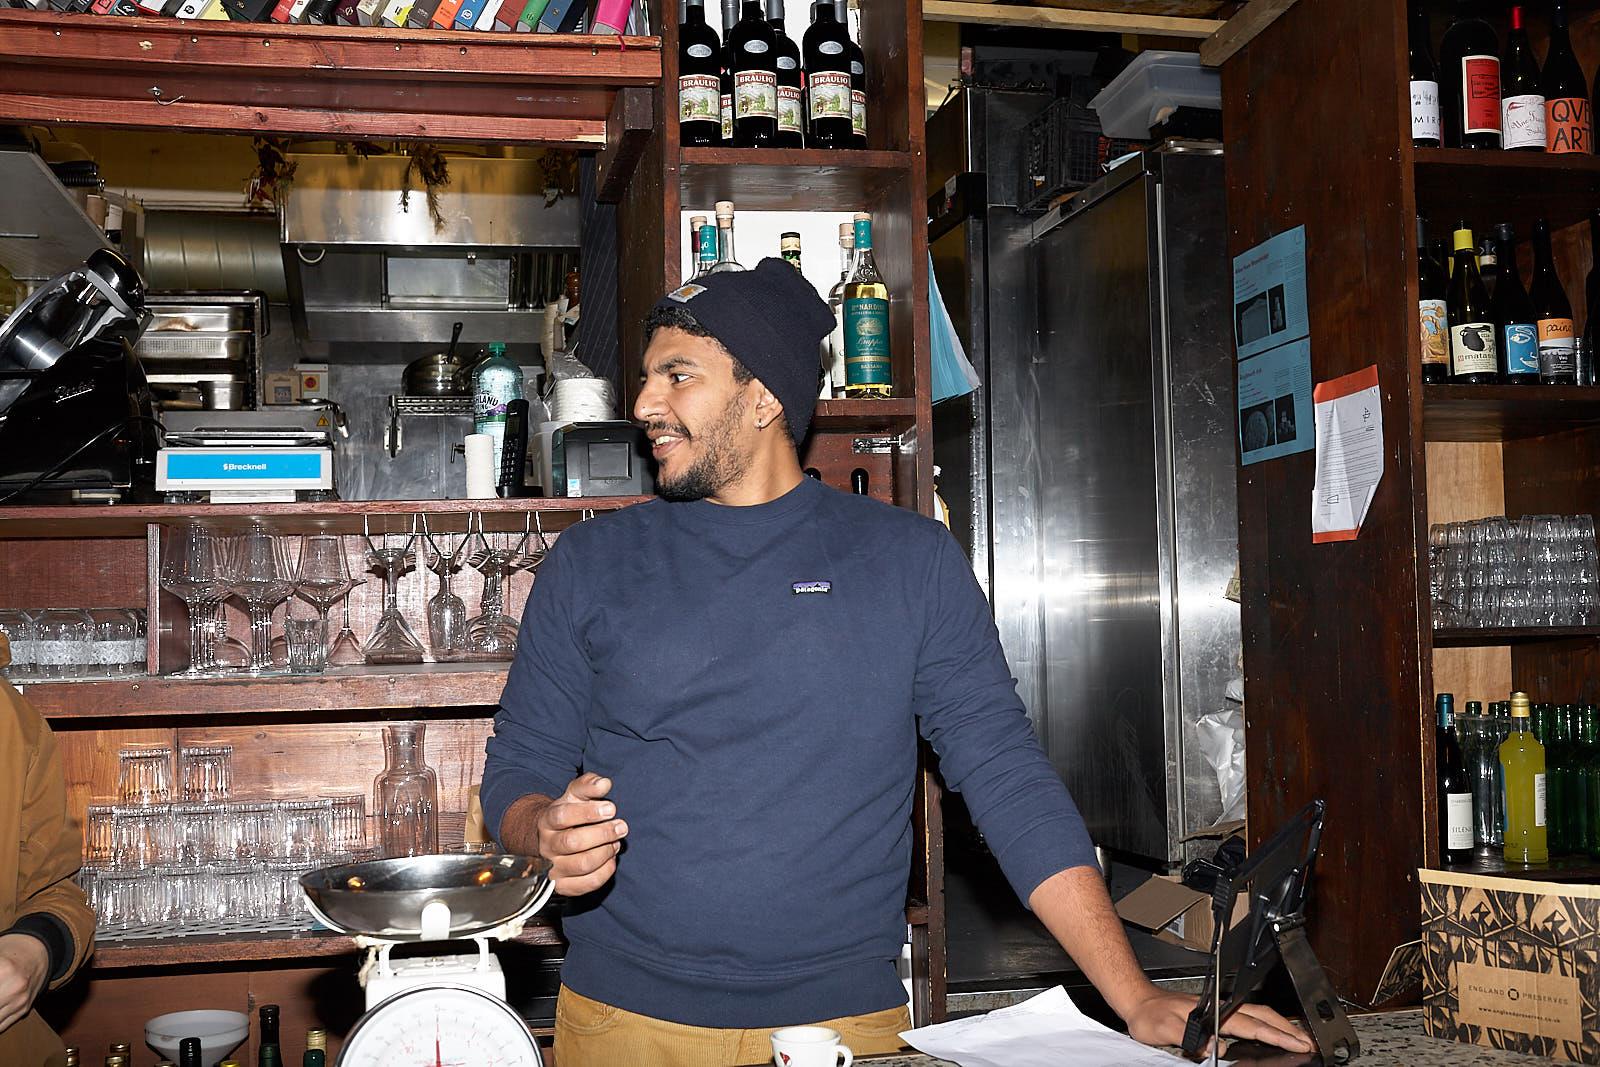 Mitshel Ibrahim at Hackney Italian trattoria Ombra in November after coronavirus national lockdown in England closed restaurants